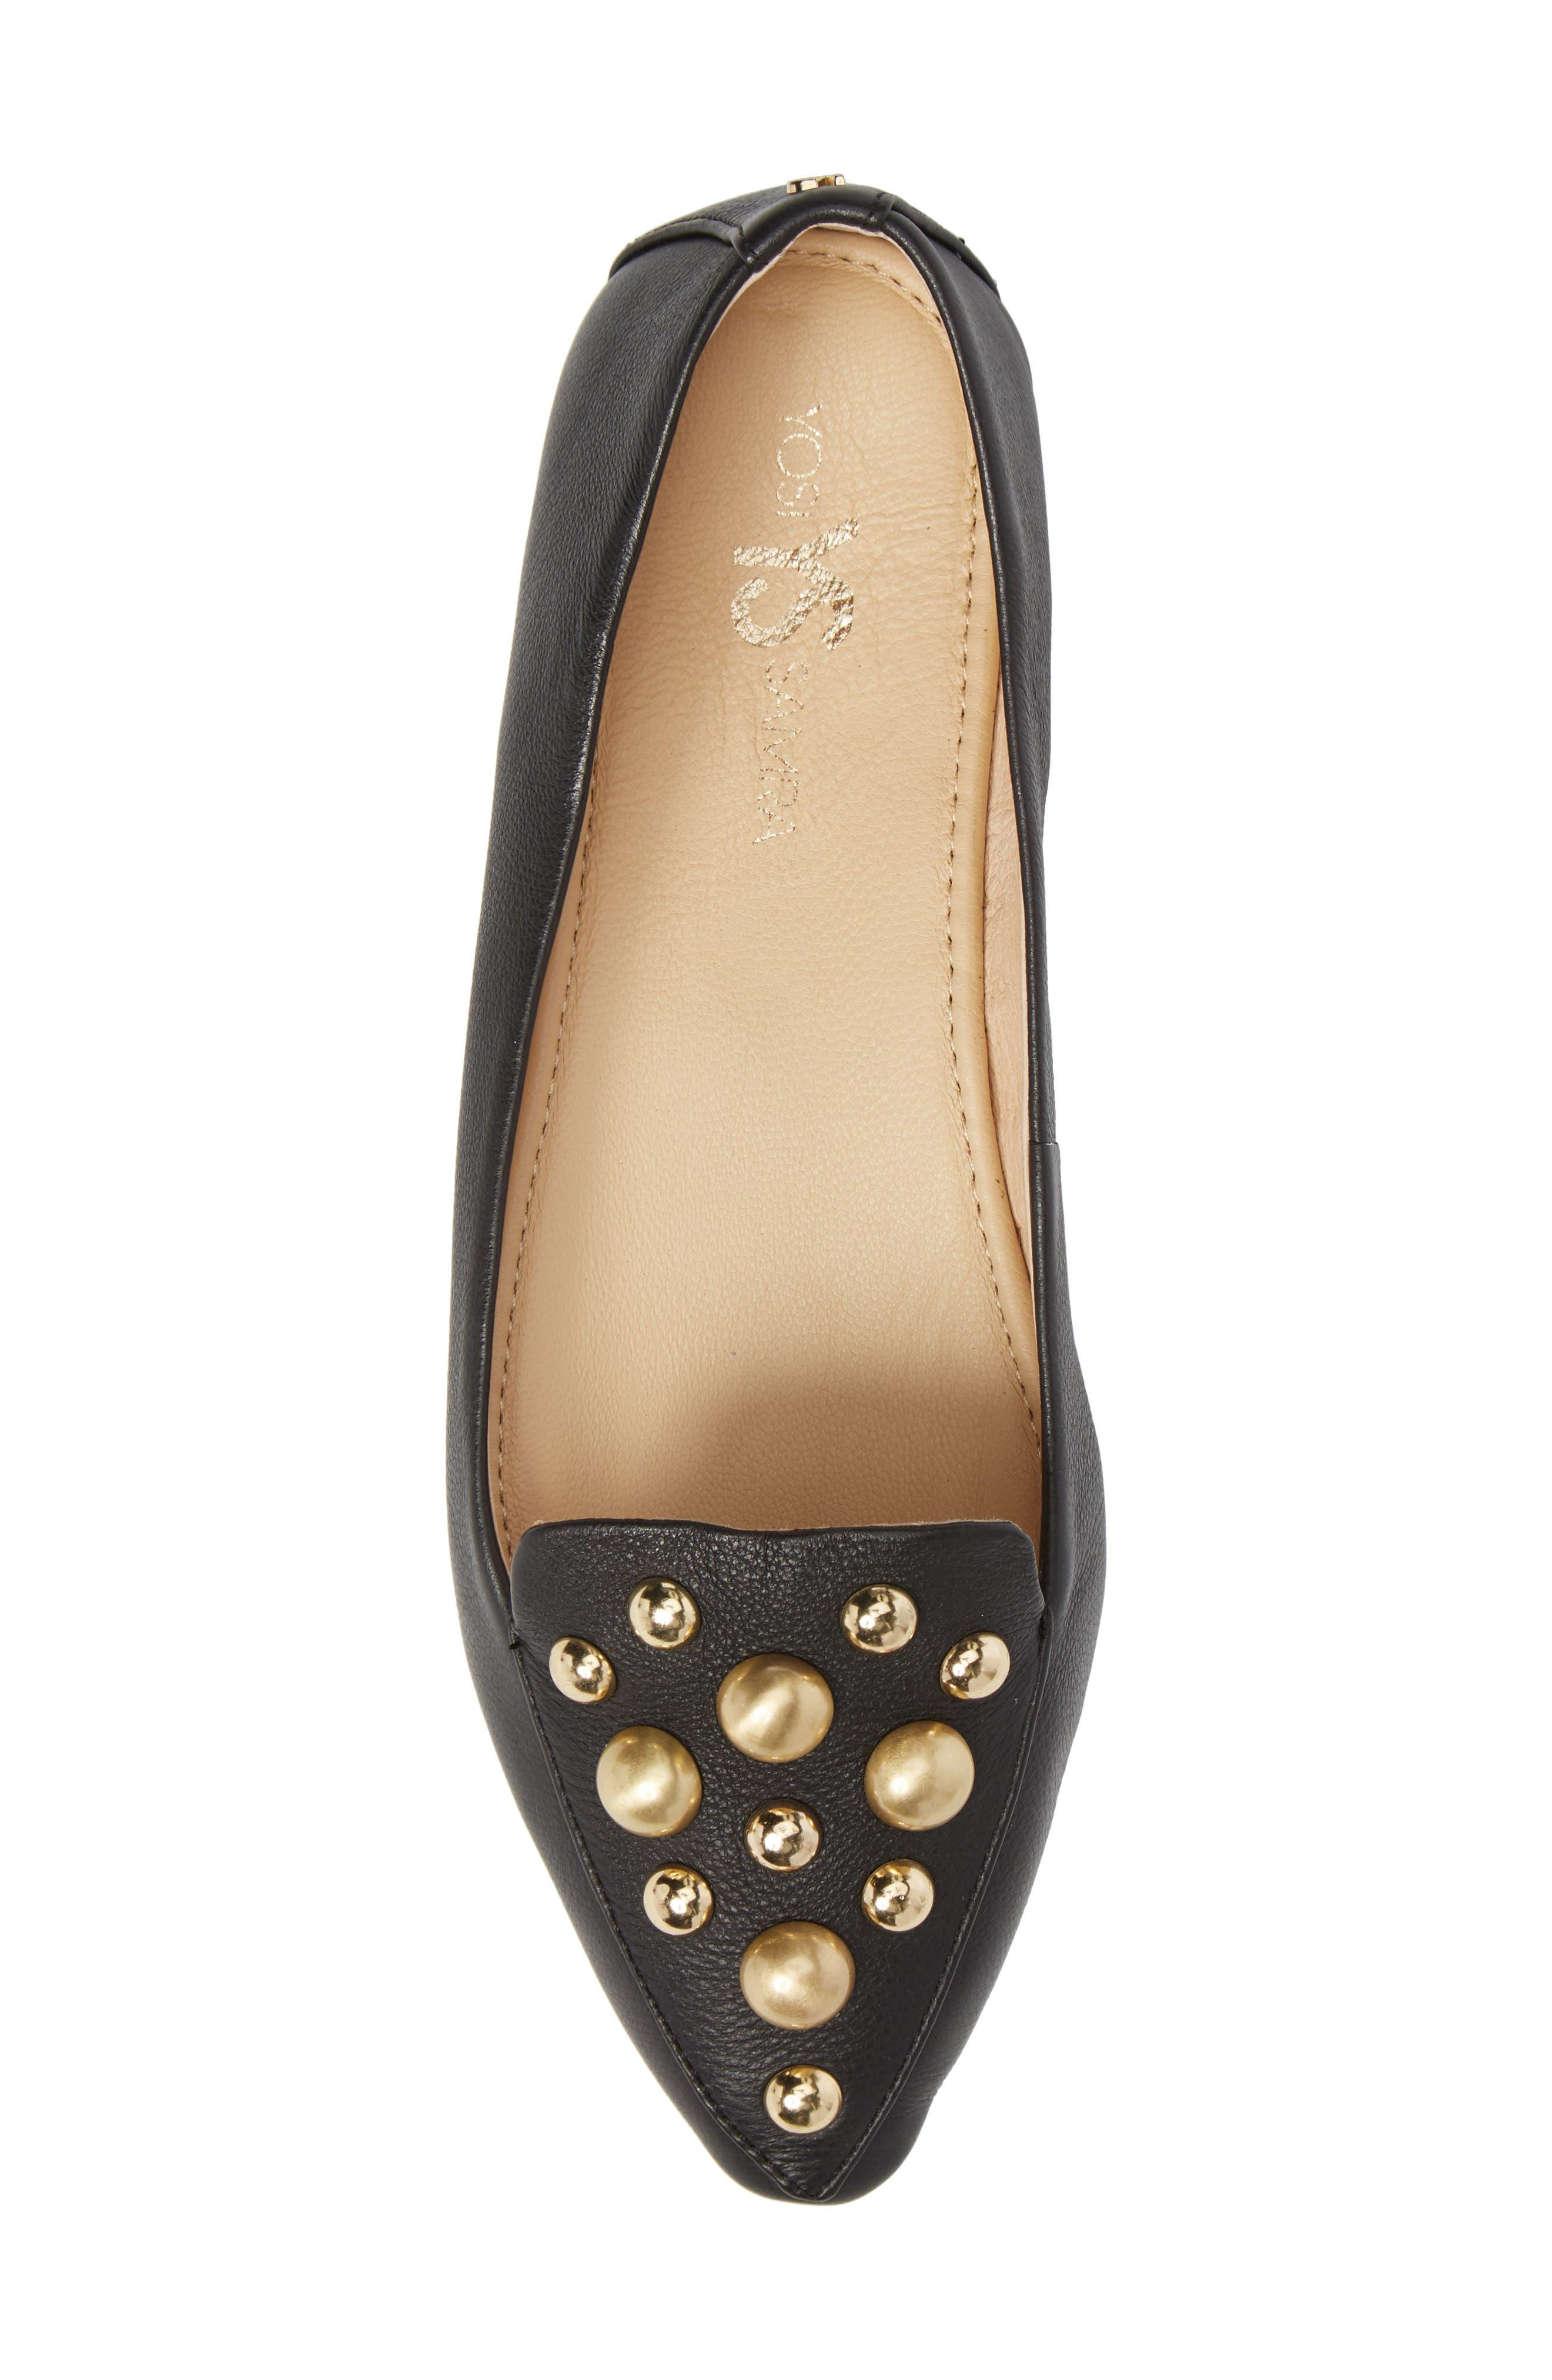 Vera Studded Loafer,                             Alternate thumbnail 5, color,                             Black/ Black Leather